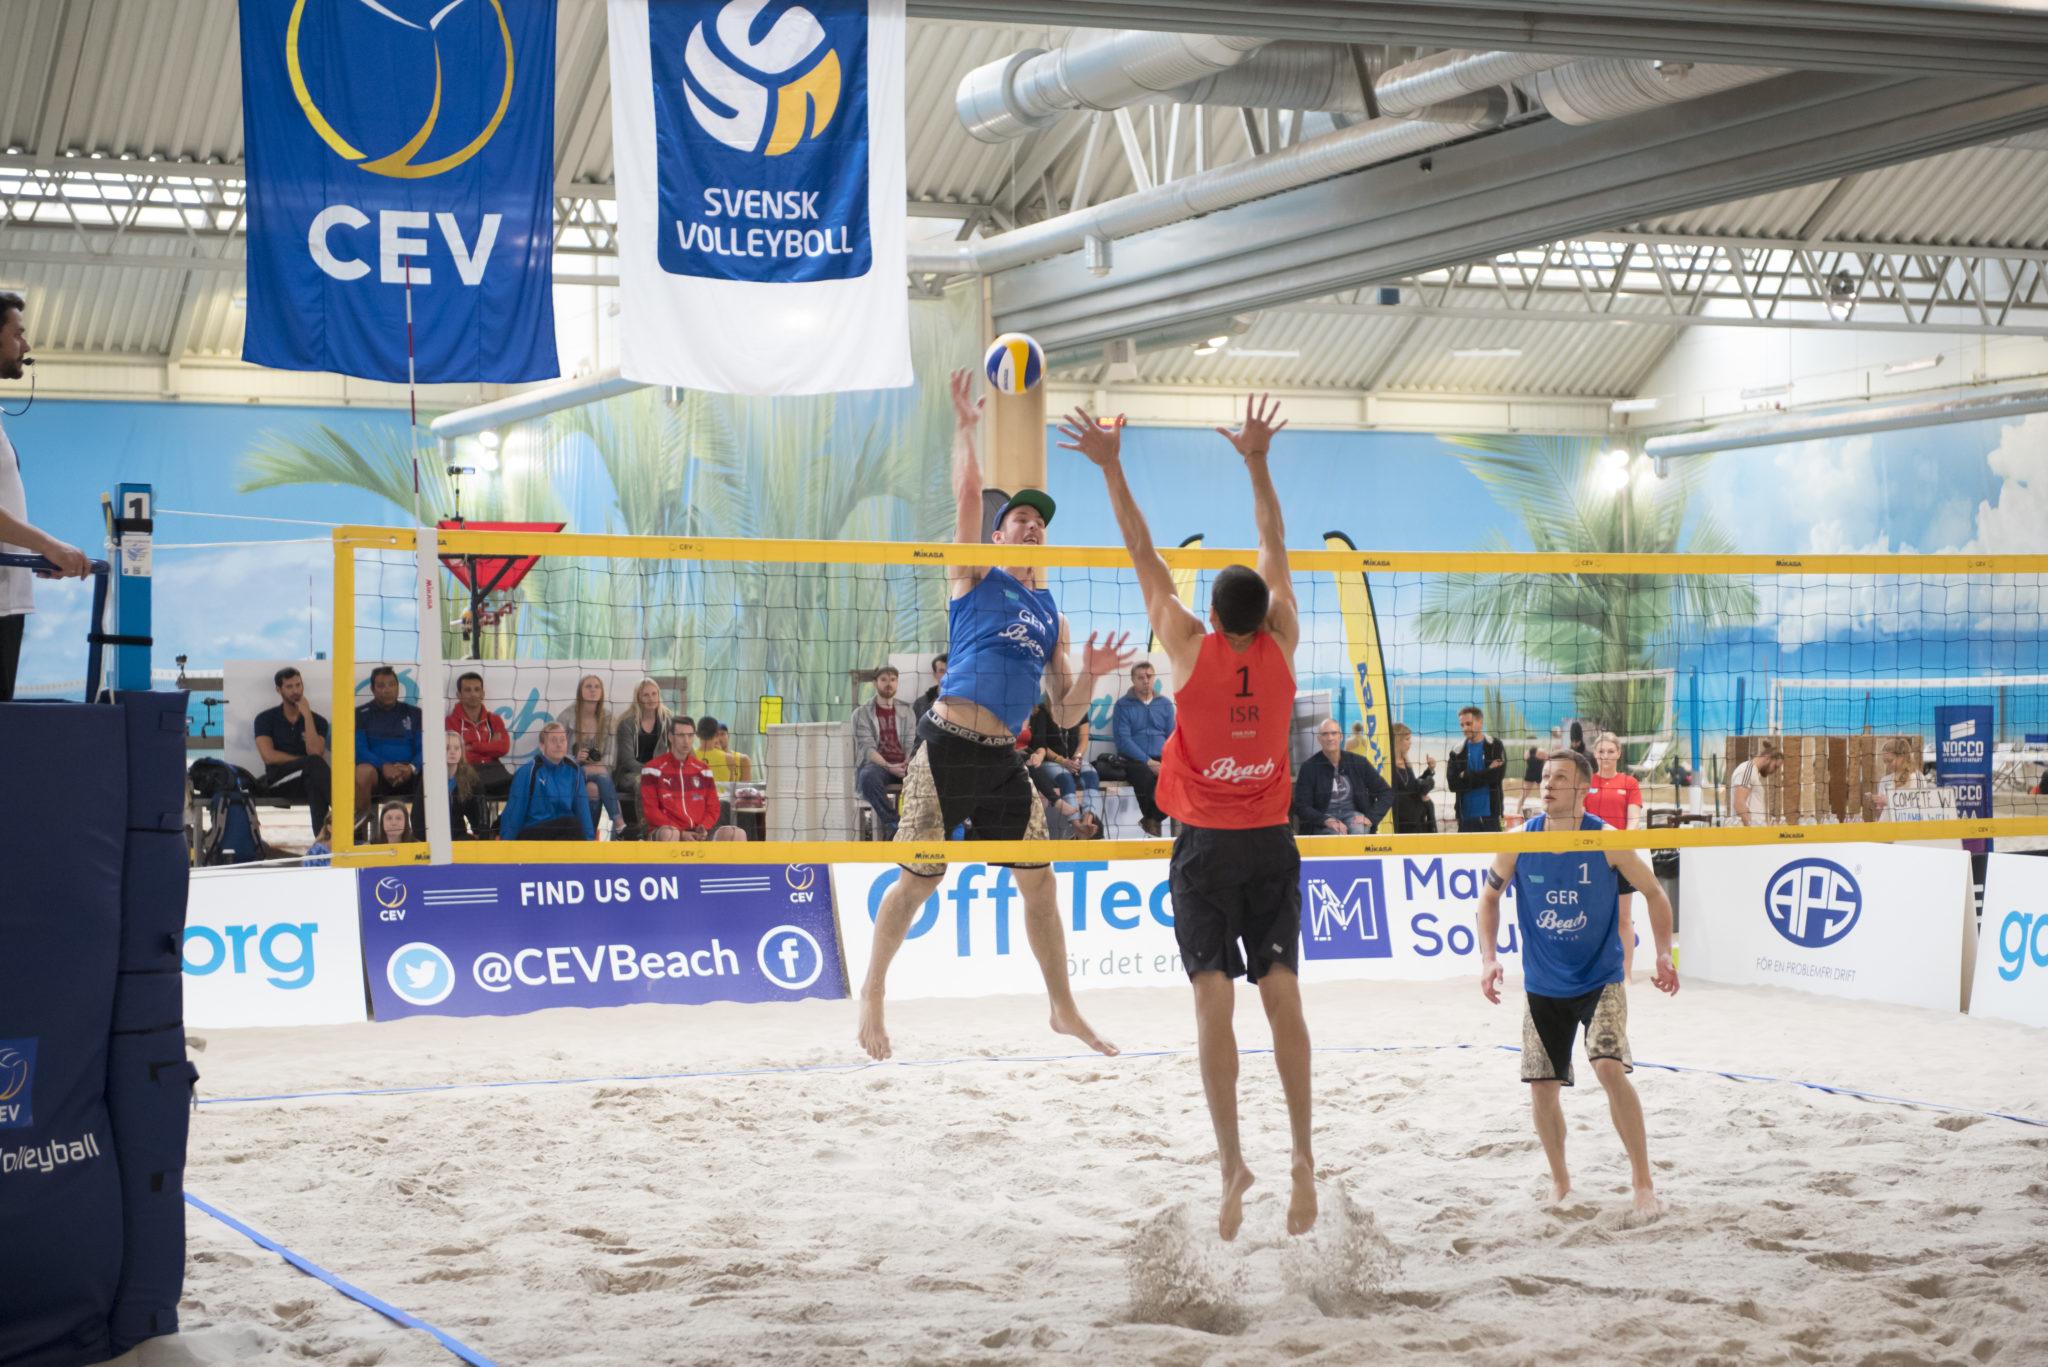 Beach Volleyball vs Indoor Volleyball